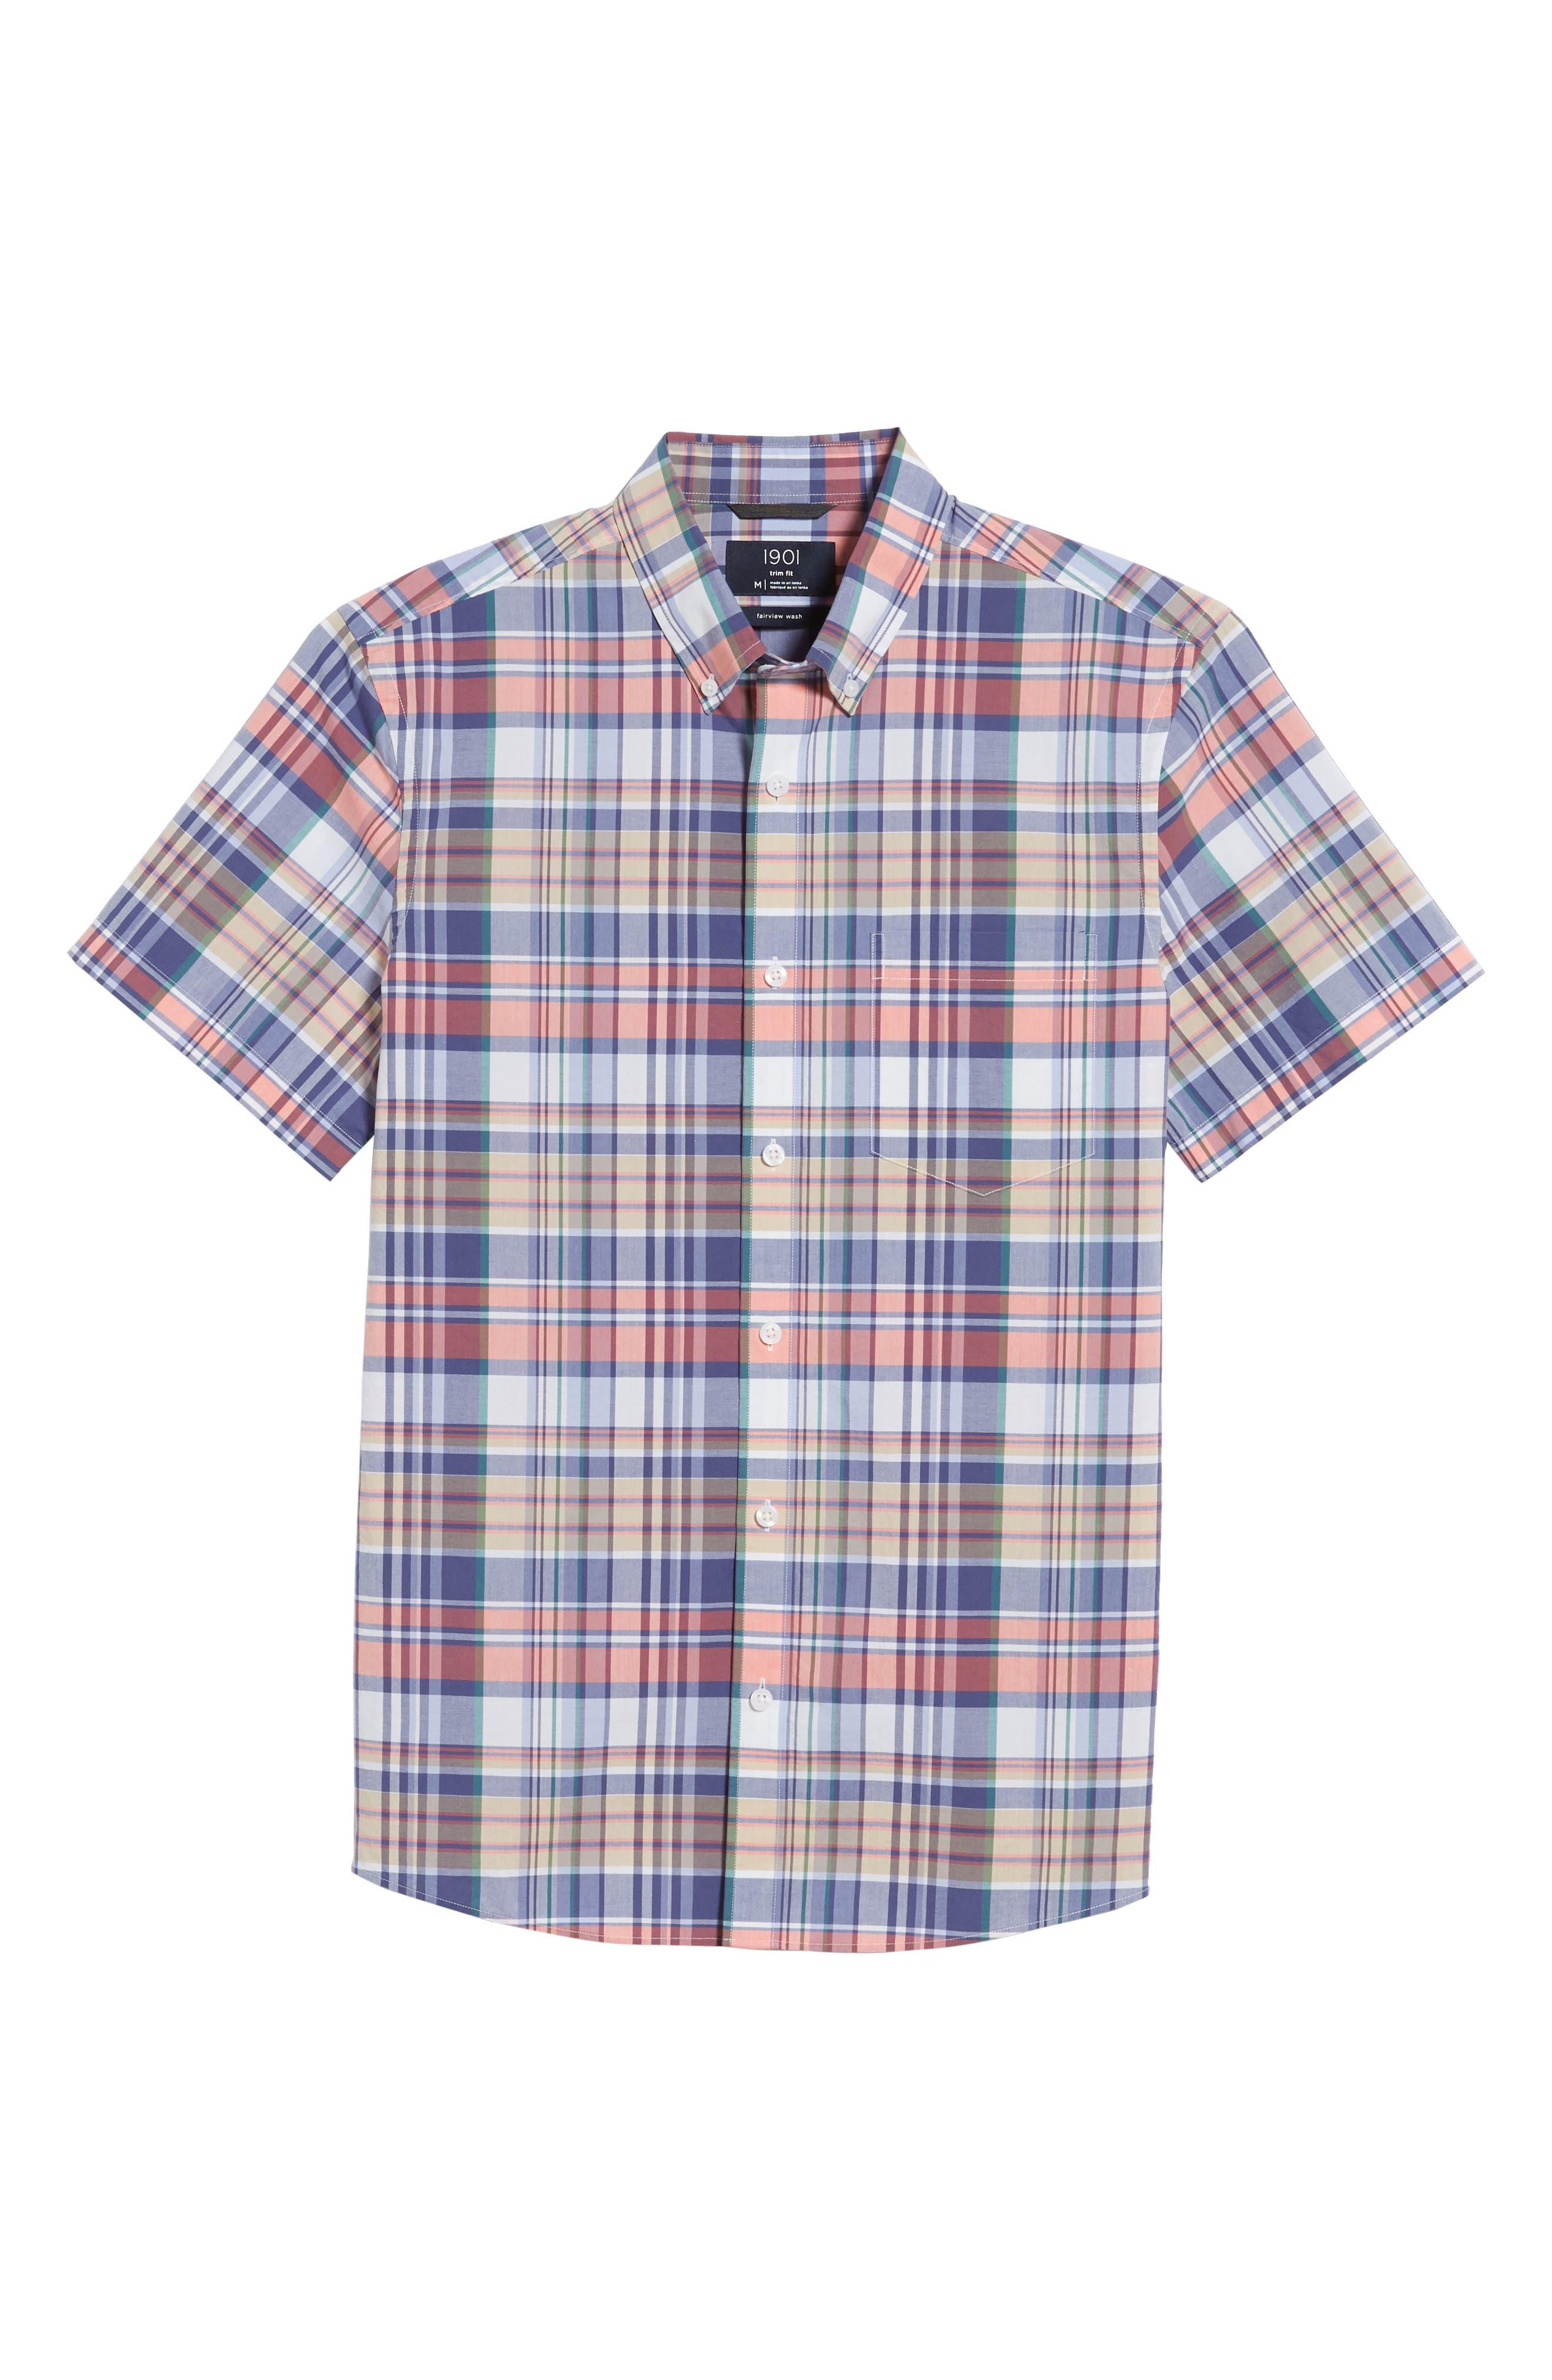 Trim Fit Plaid Short Sleeve Sport Shirt,                             Alternate thumbnail 6, color,                             Navy Coral Multi Plaid